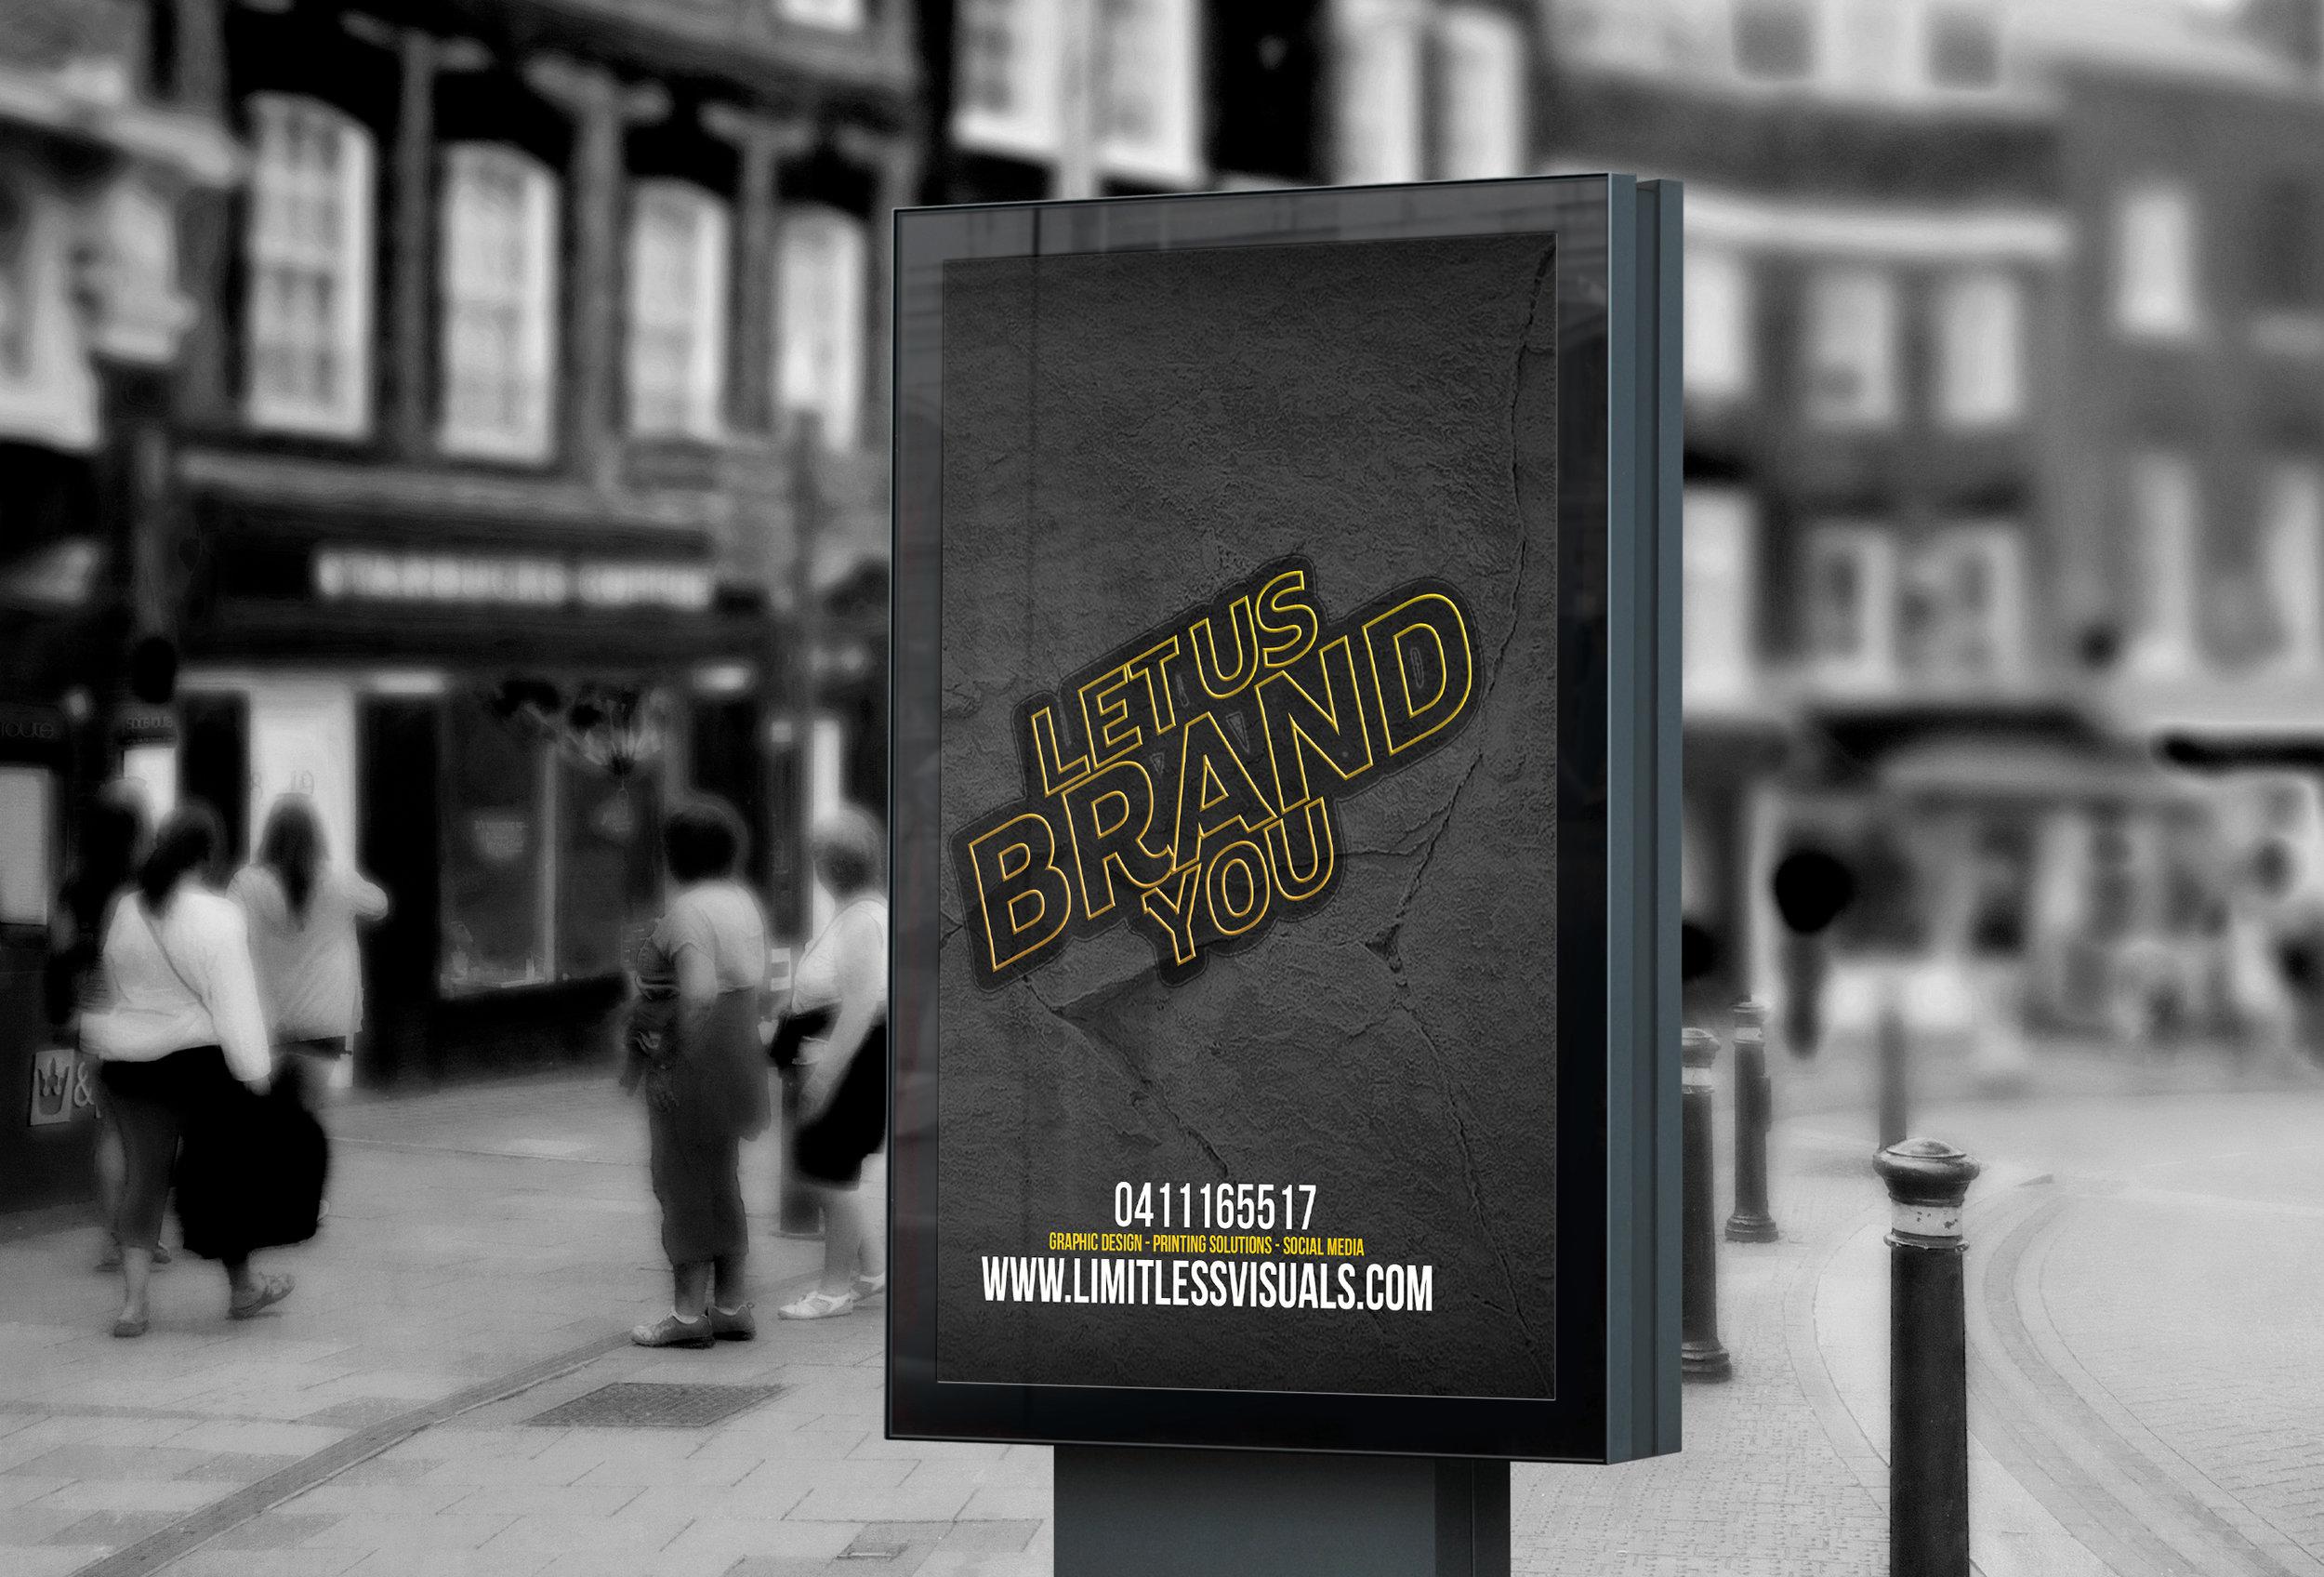 Billboard design, Shop now!